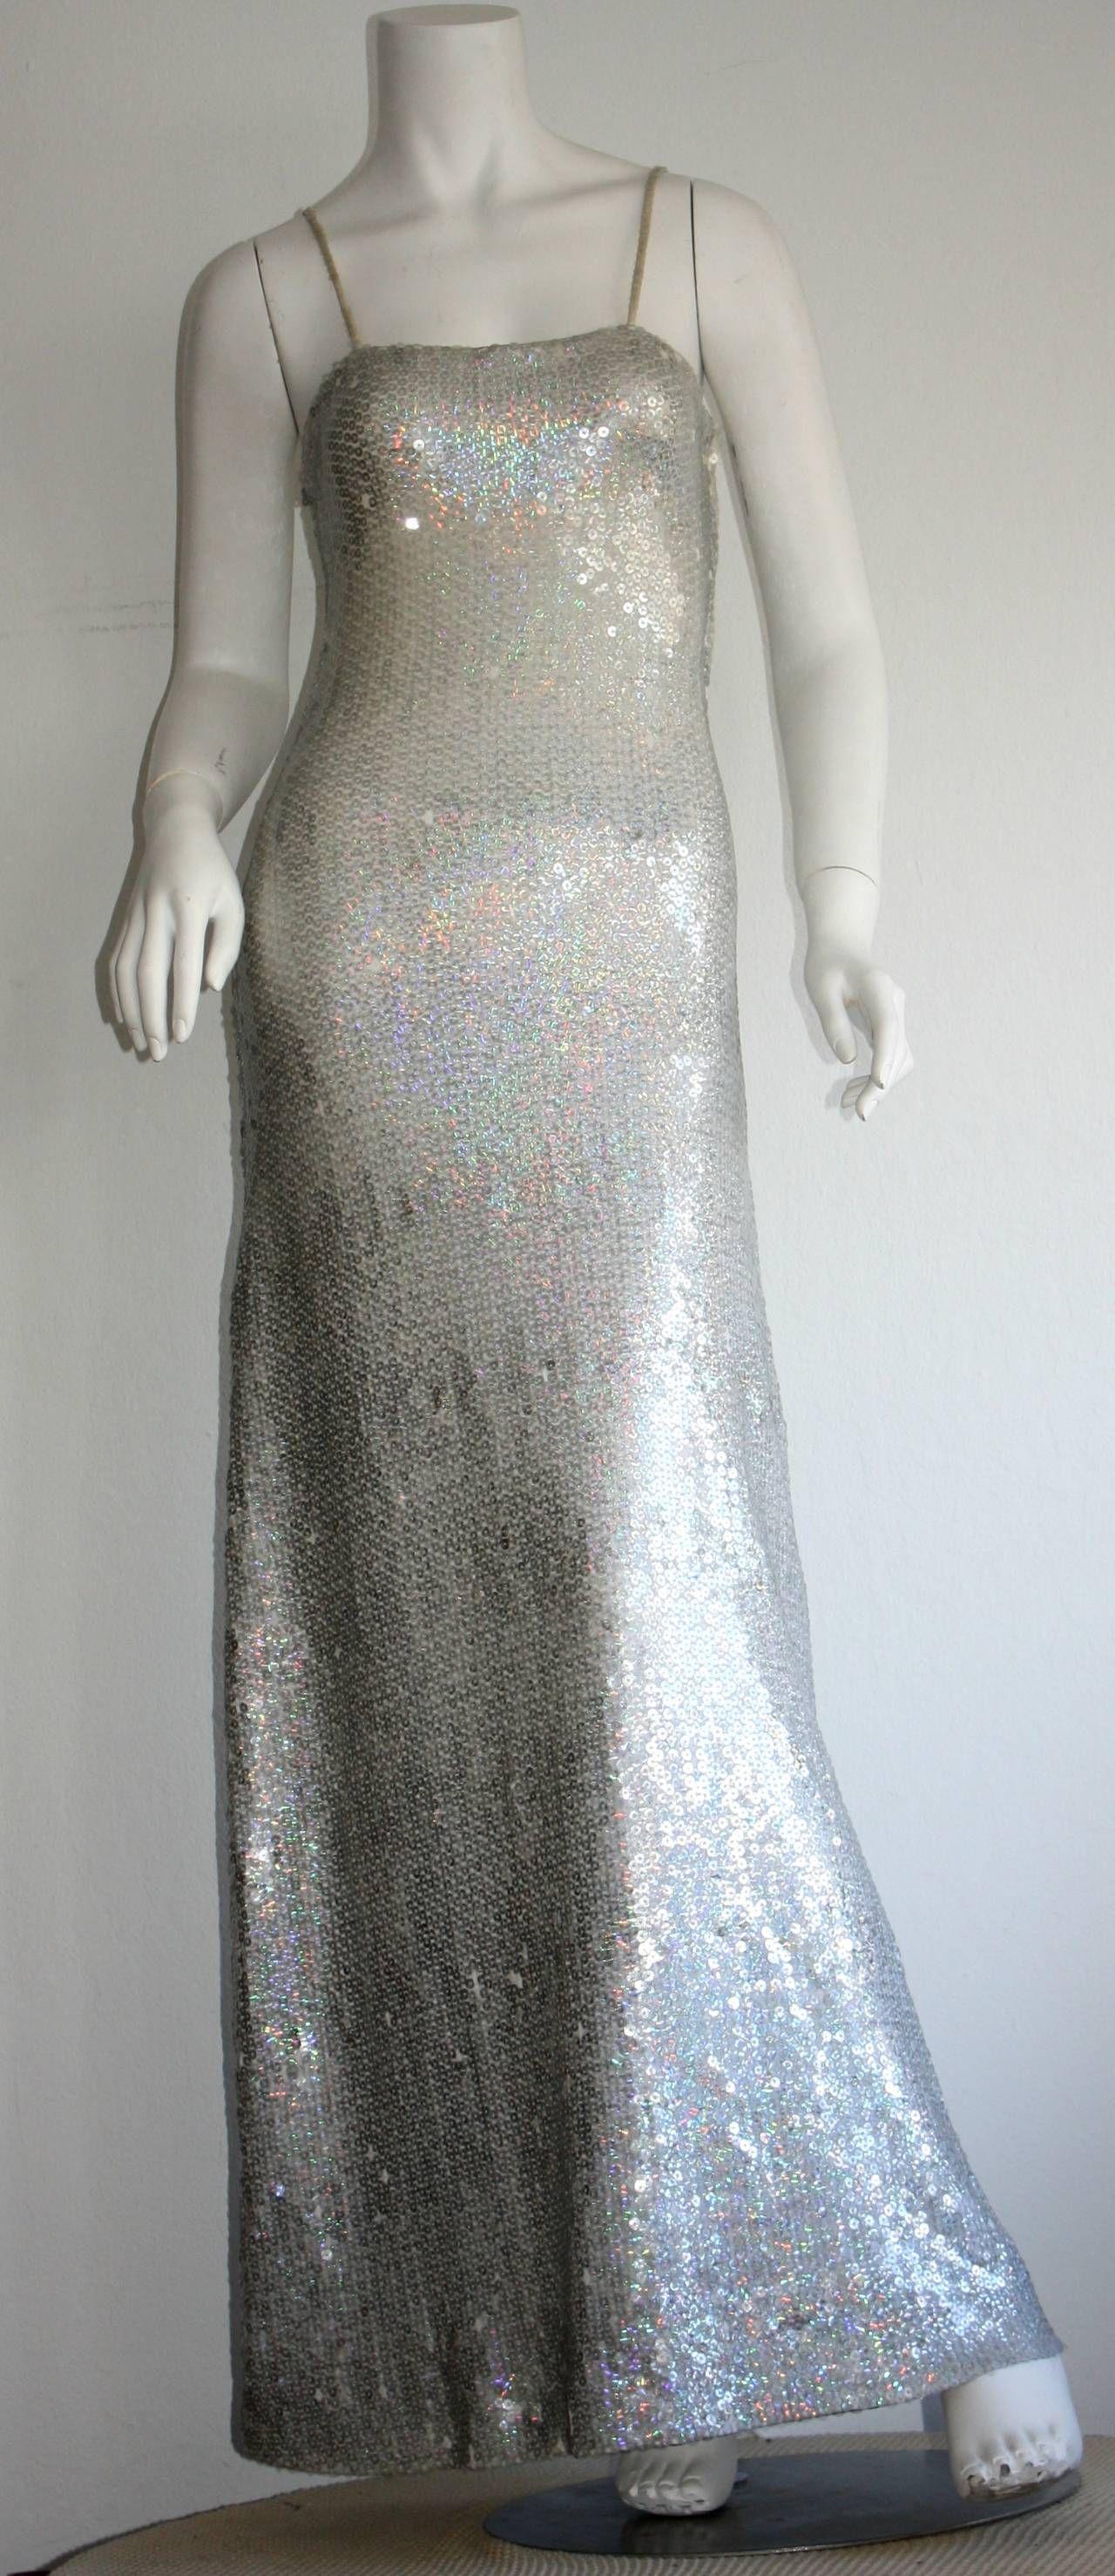 Vintage Halston 1970s Iridescent Sequin Mermaid Gown | Mermaid gown ...